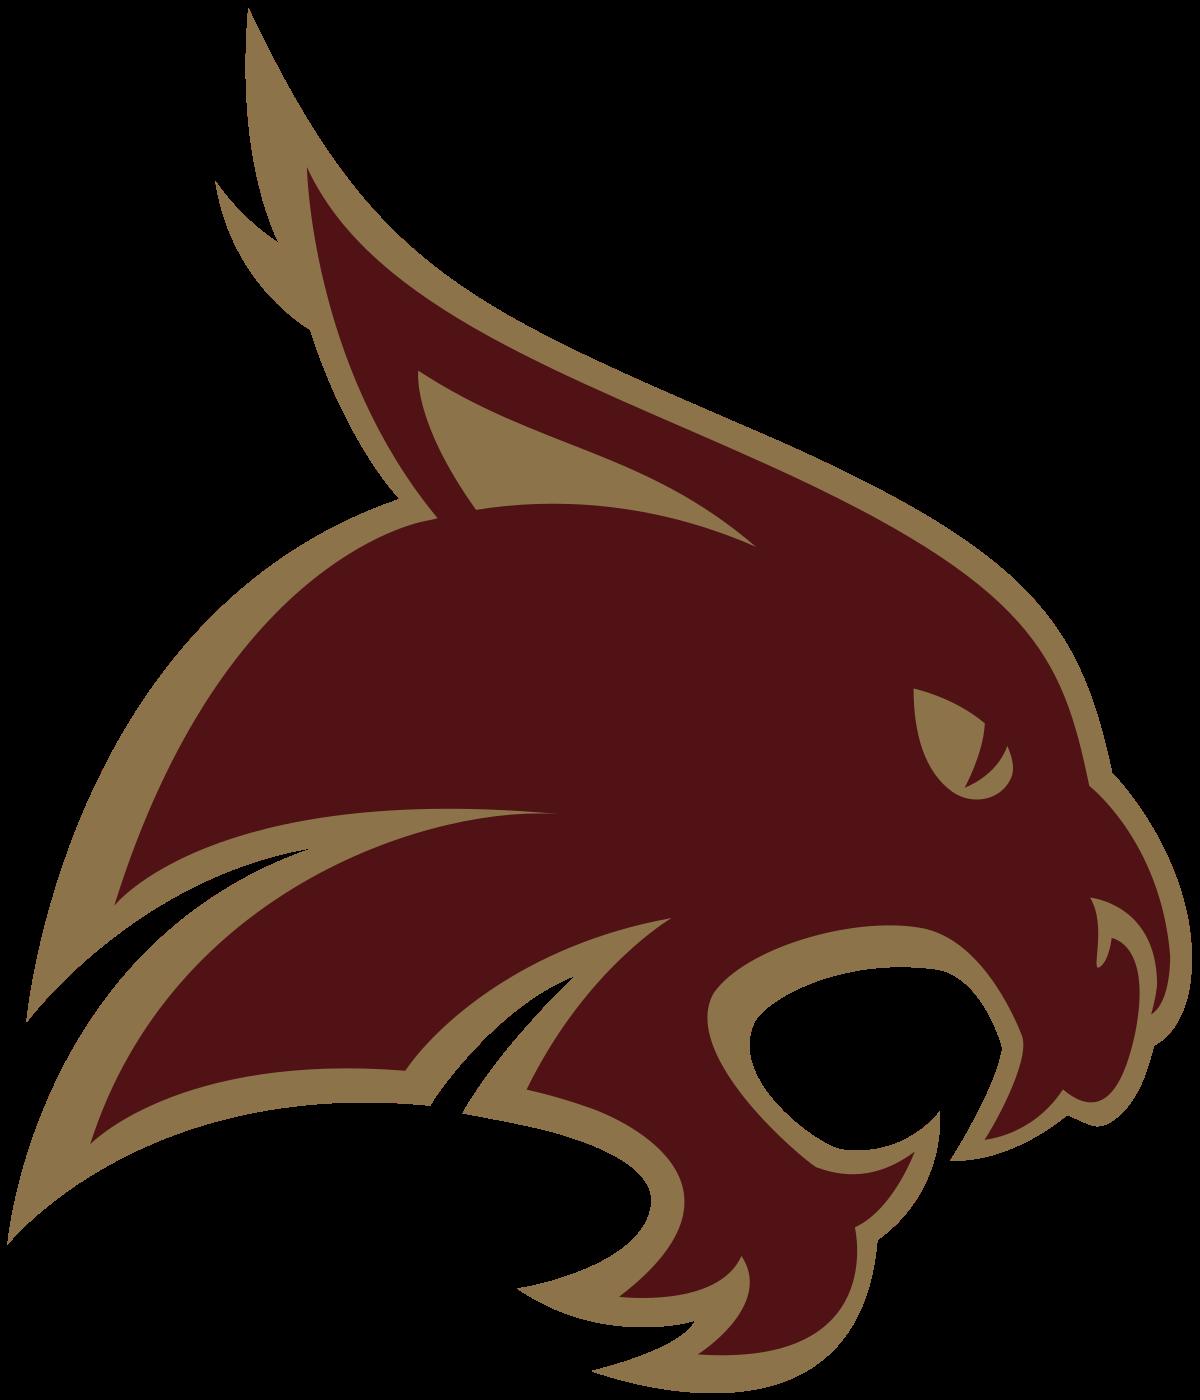 Bobcat clipart texas state. Bobcats wikipedia